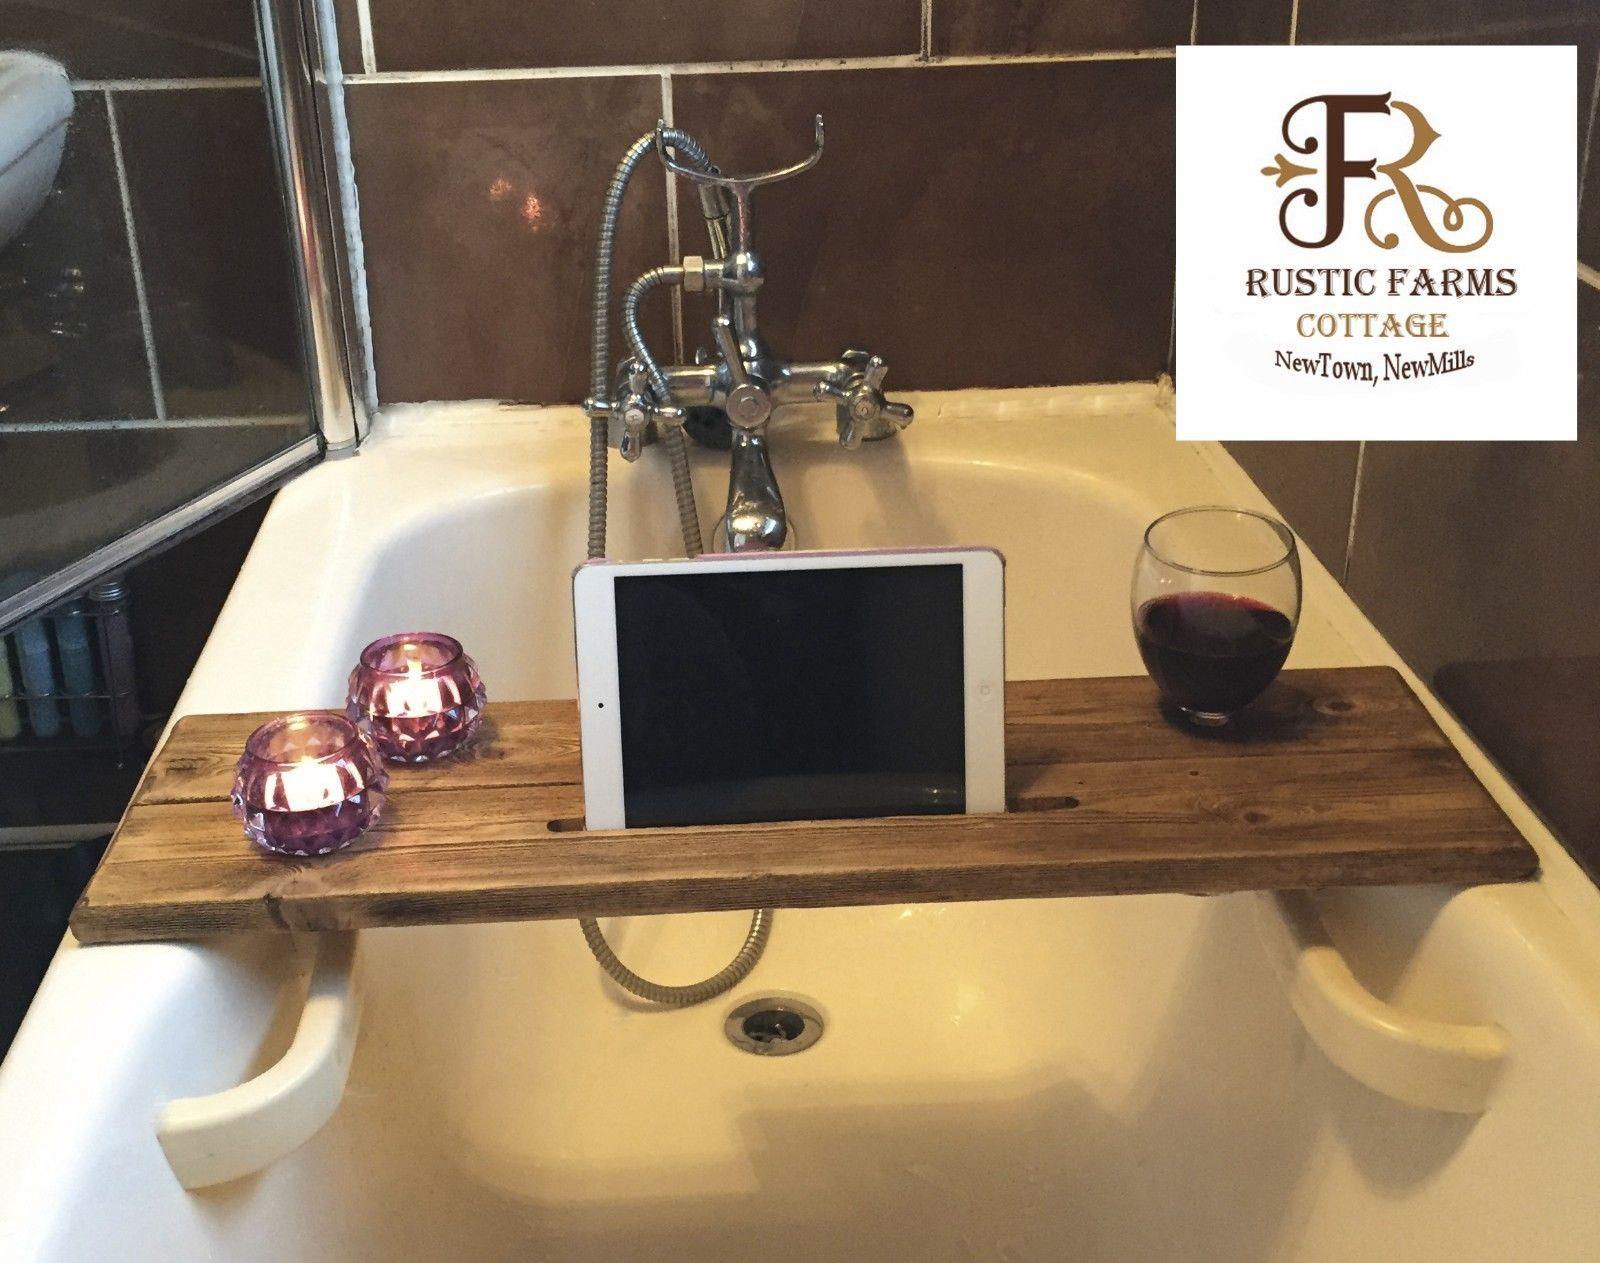 Rustic Farm Cottage Bath Shelf Caddy Ipad Holder And Wine Buddy In Home